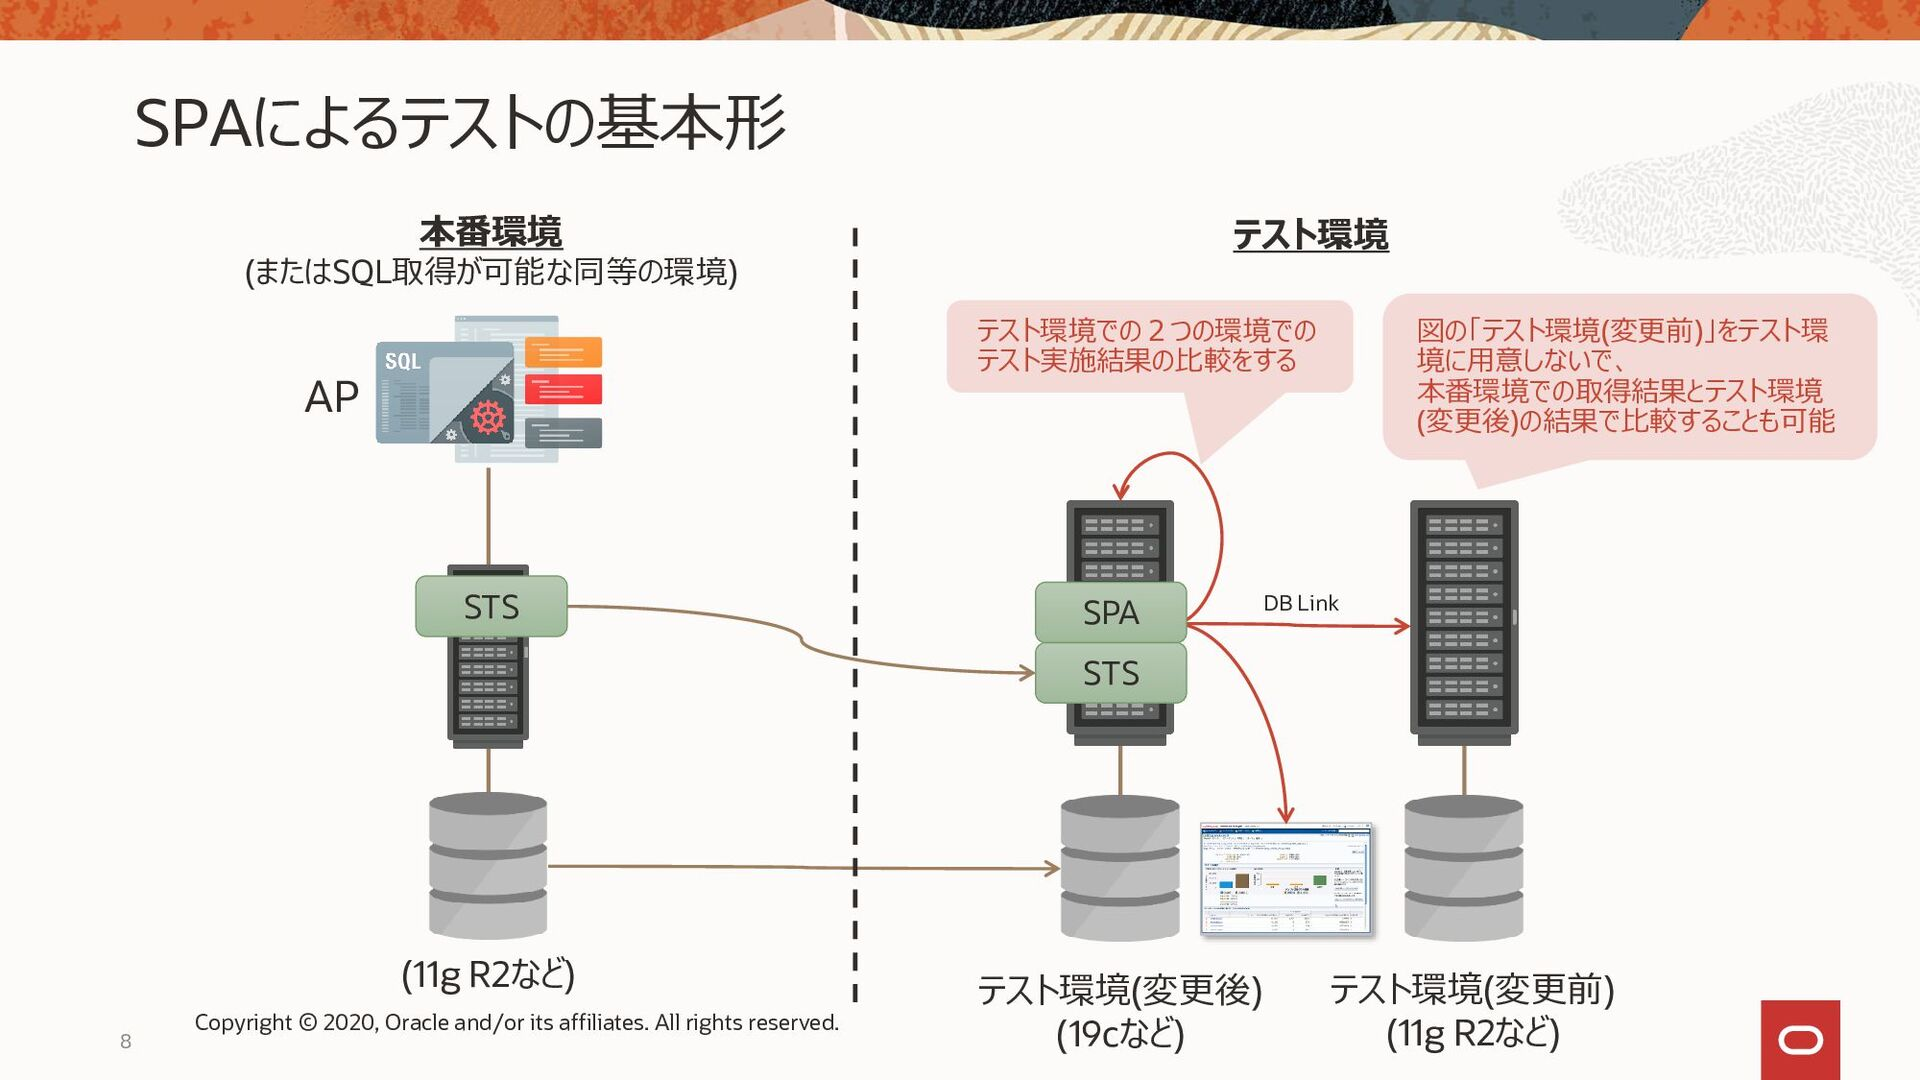 AP 本番環境 (またはSQL取得が可能な同等の環境) テスト環境 DB Link STS S...